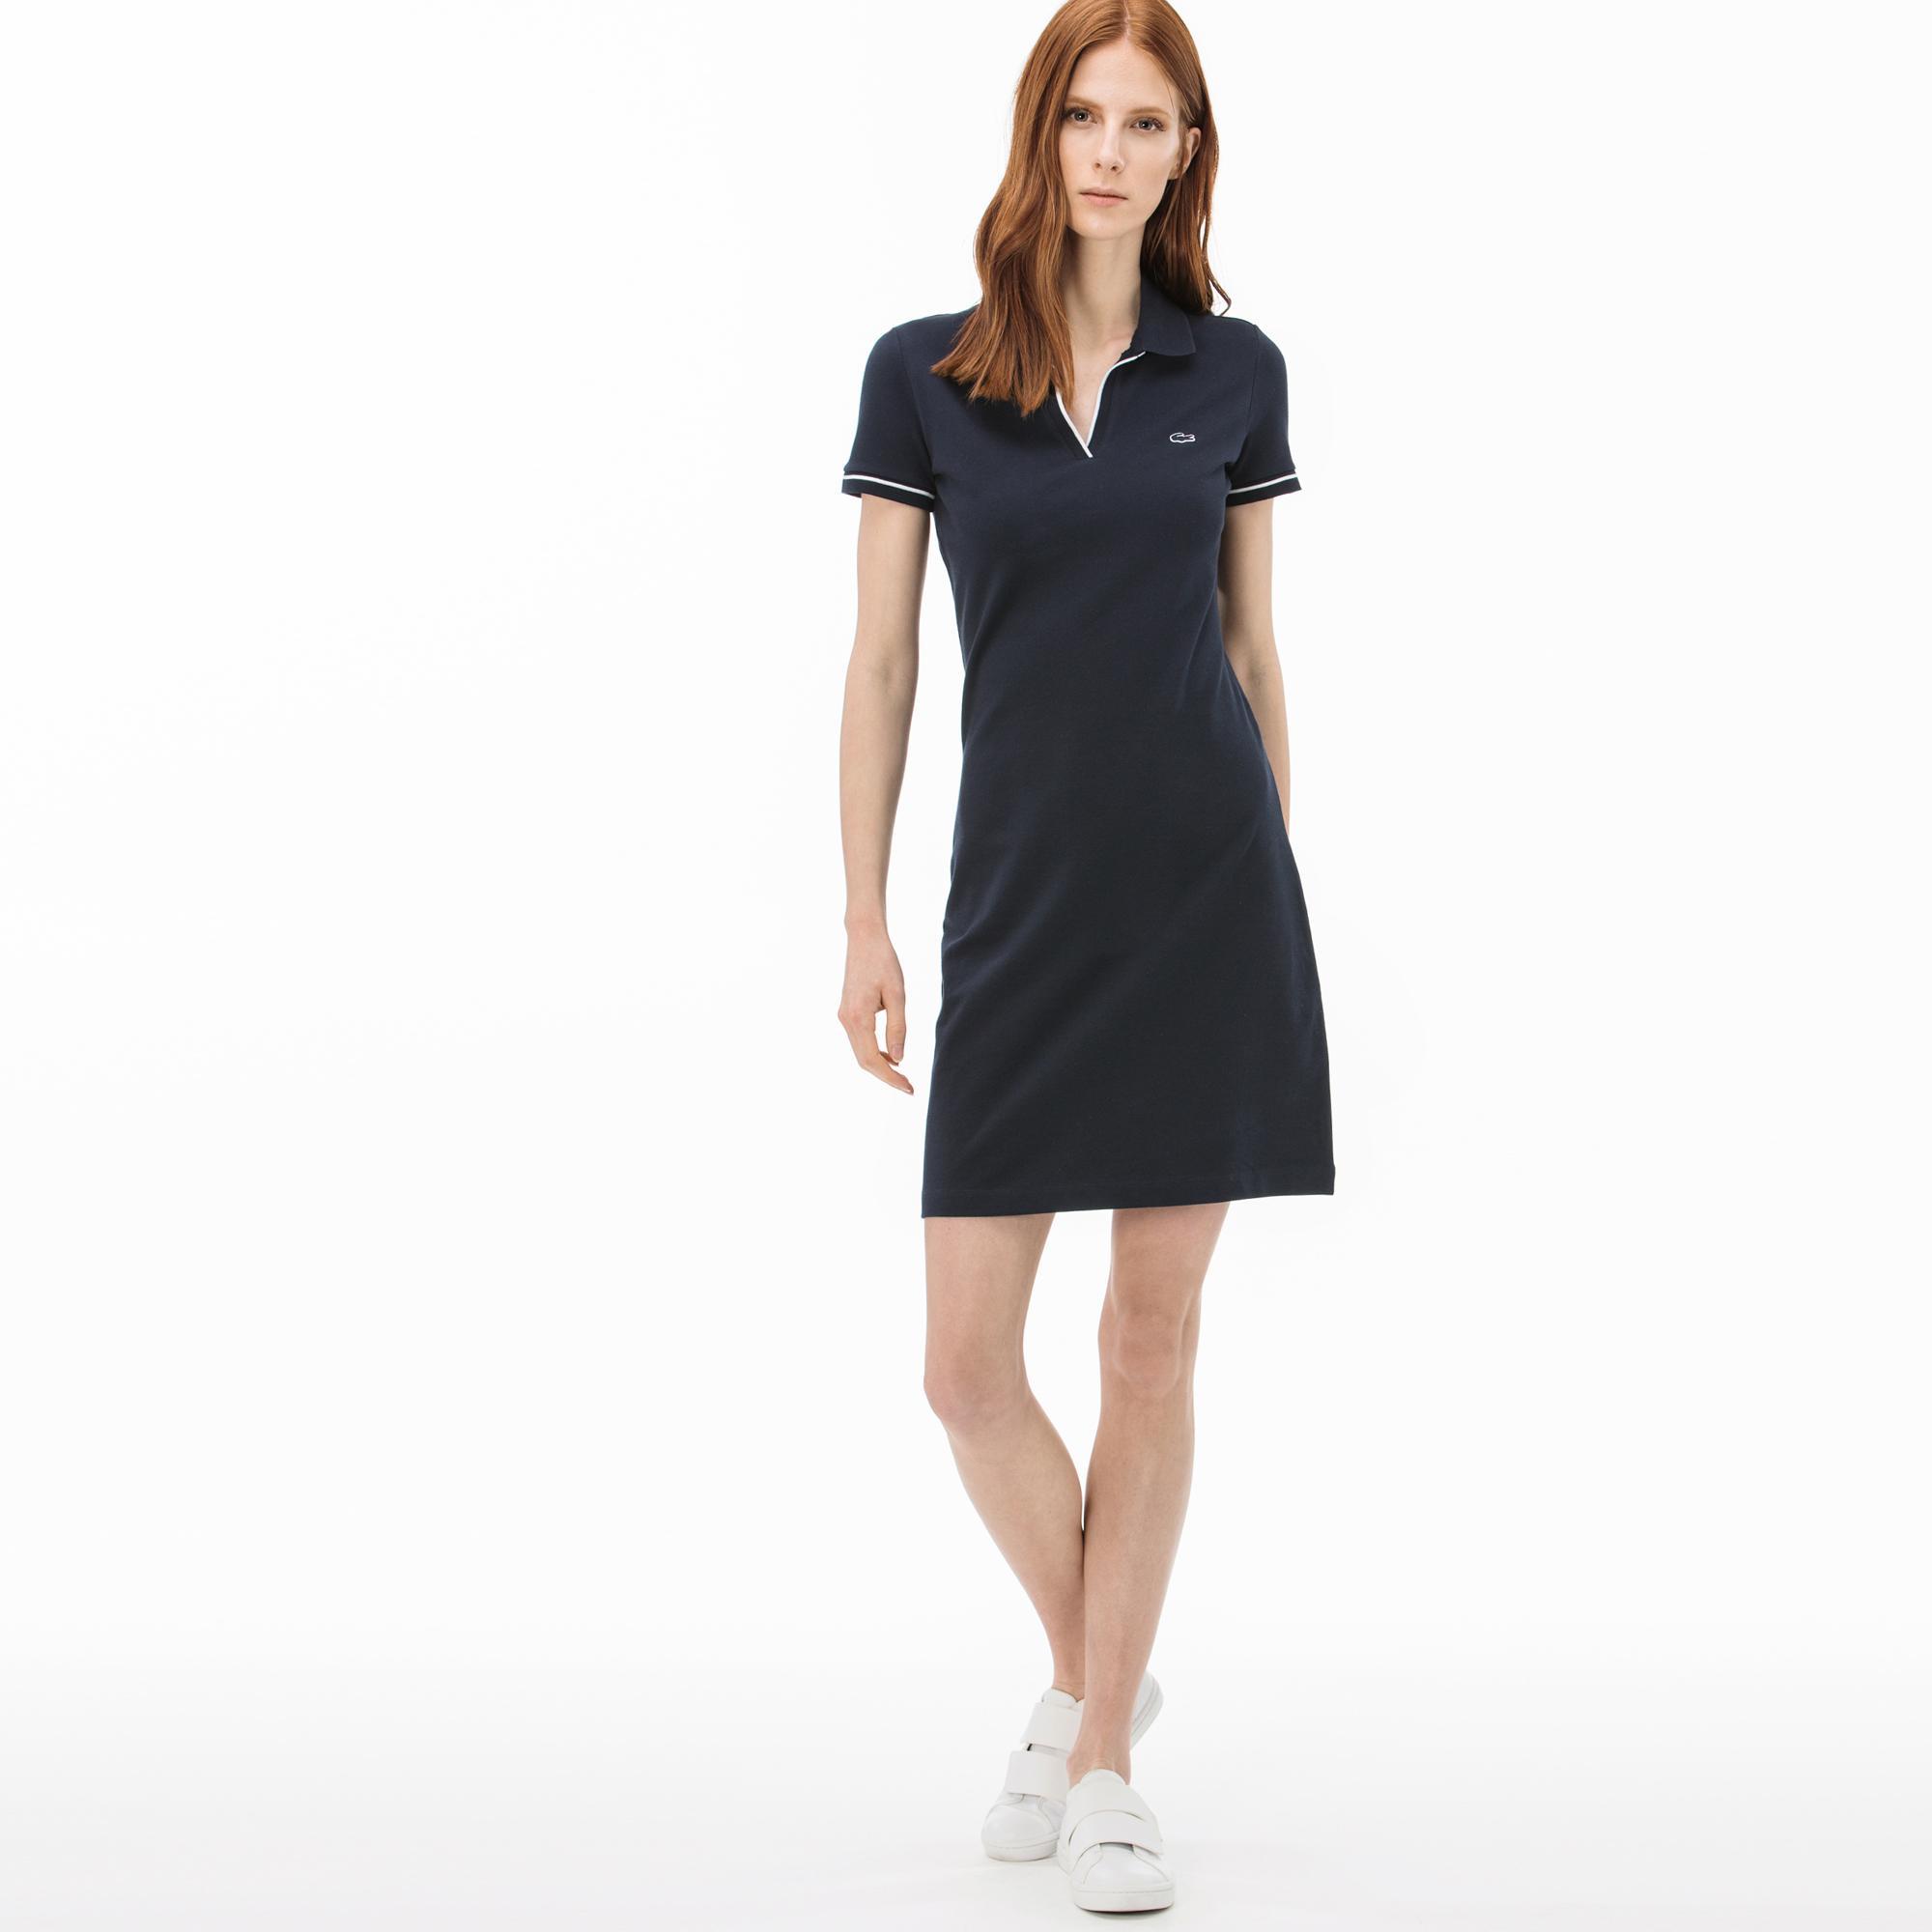 Lacoste Women's Polo Collar Short Sleeve Dress